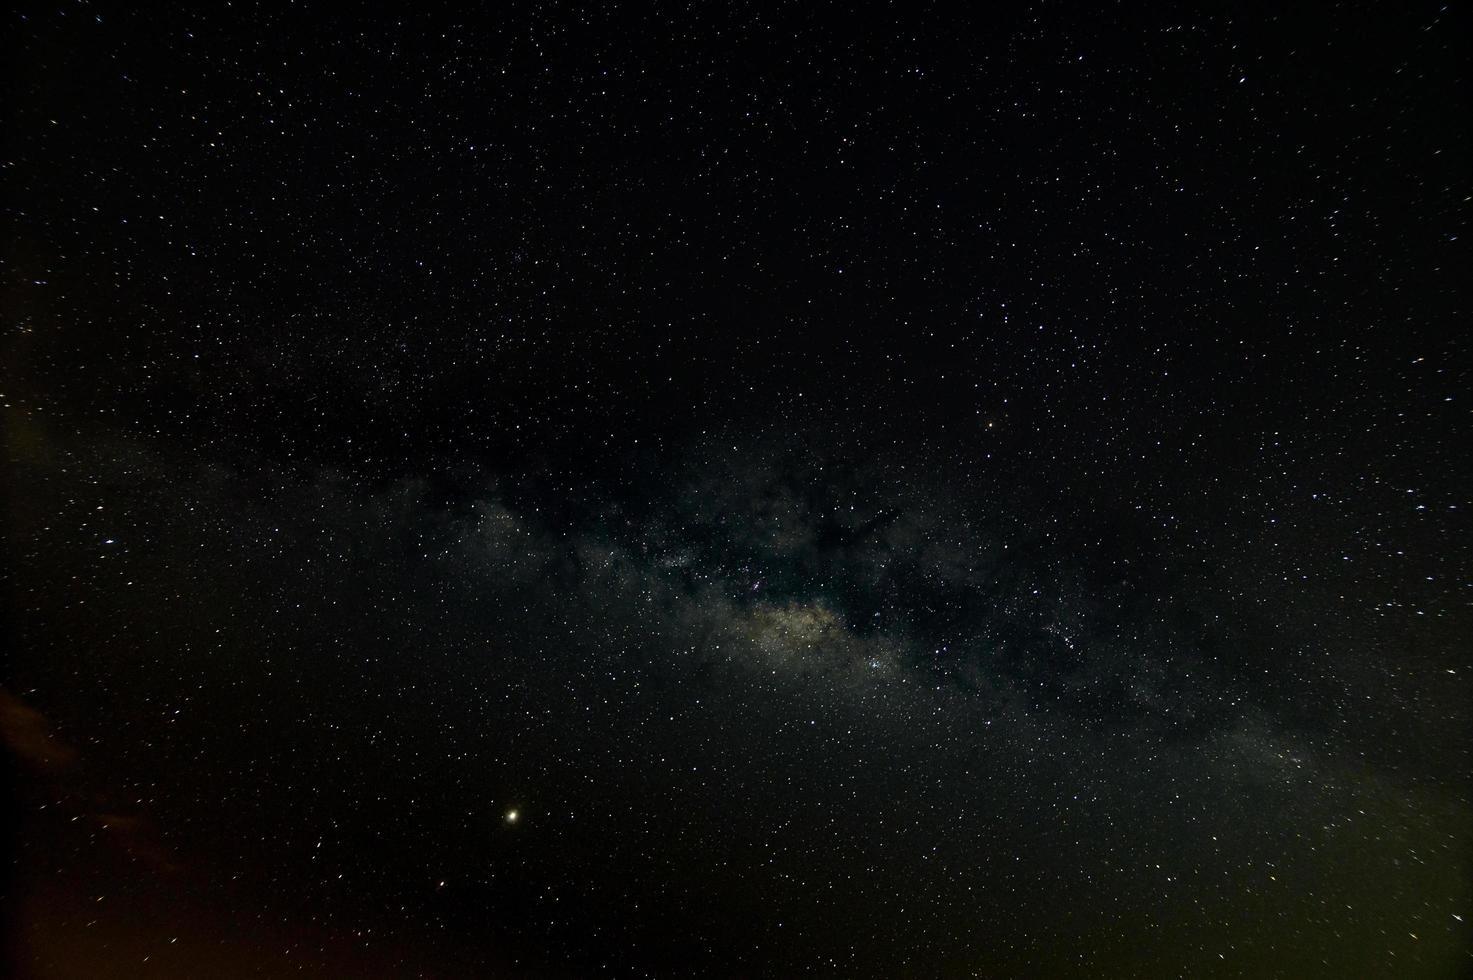 Milky Way in deep night sky photo